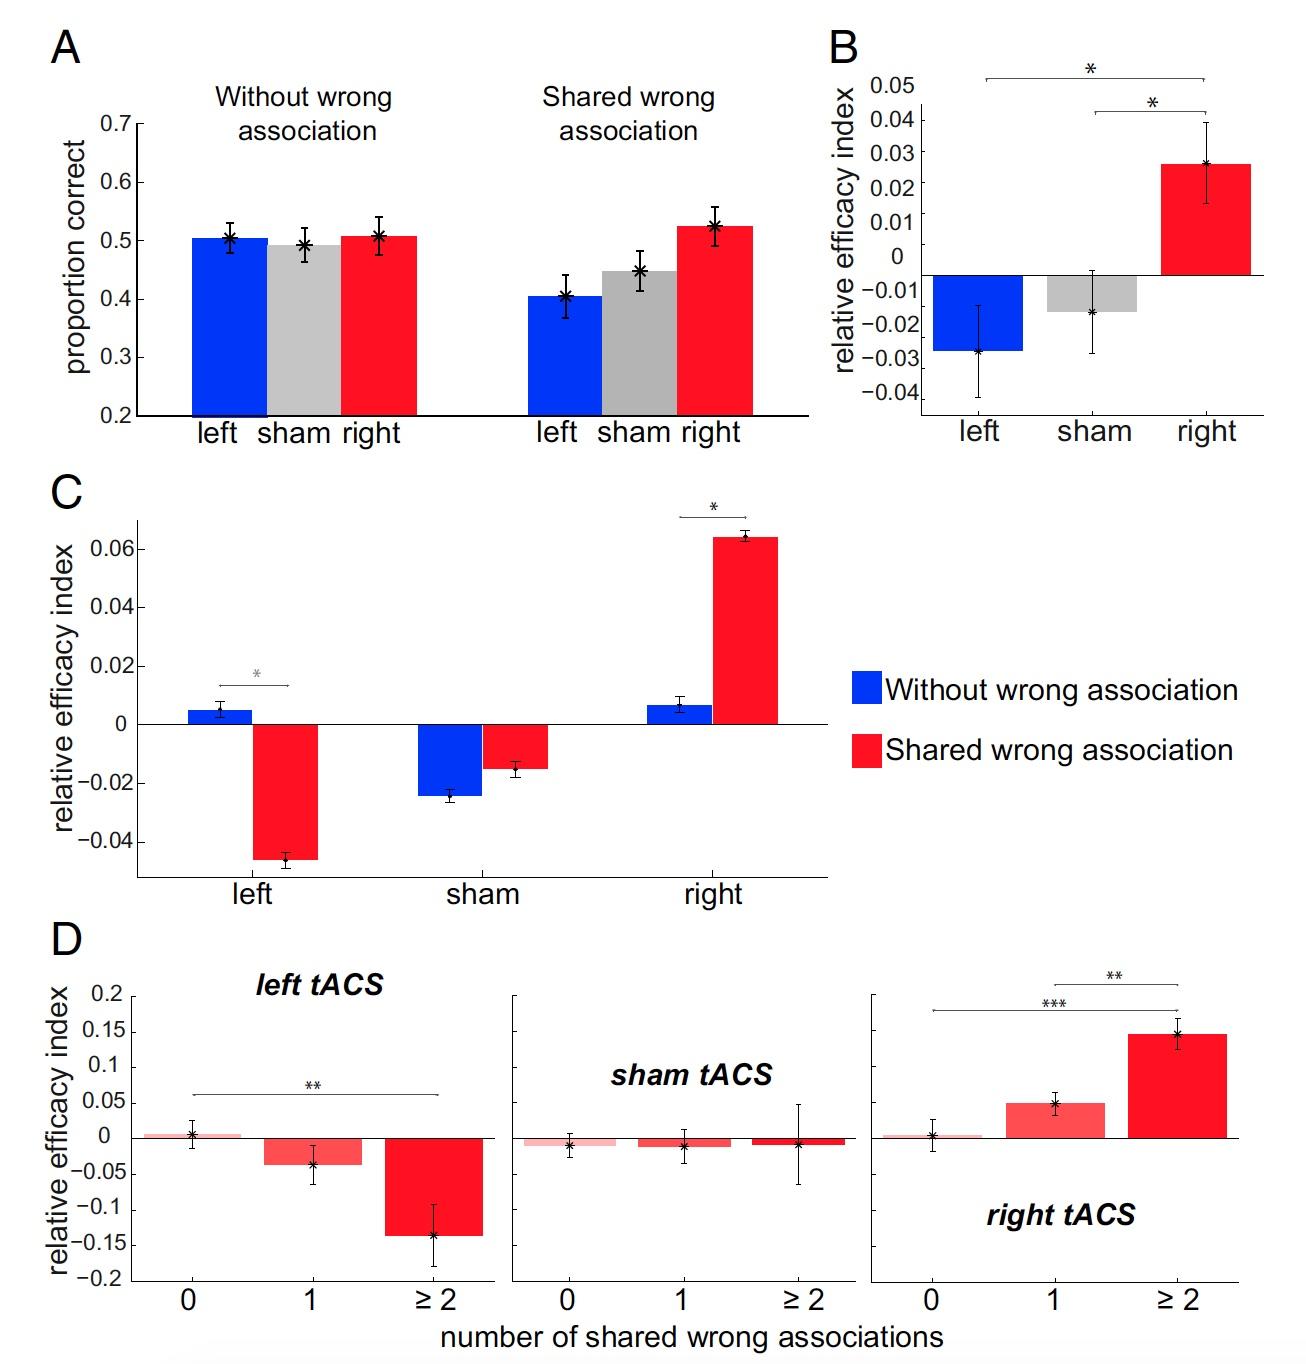 Откуда берется креативность: анализ активности альфа-волн мозга во время RAT-тестов - 6